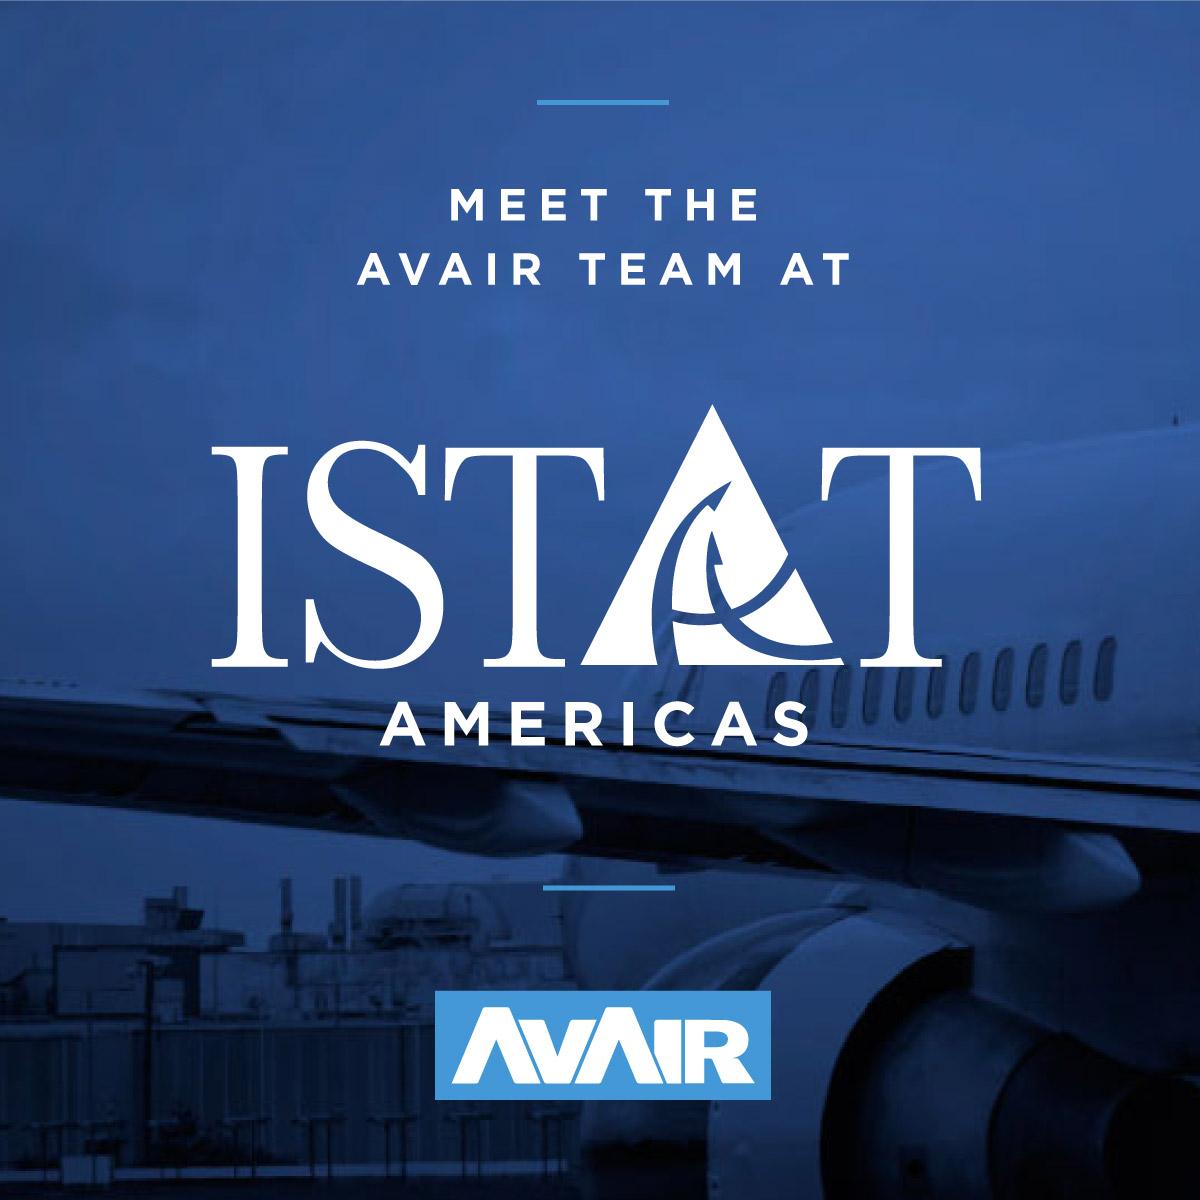 AvAir_MeetTheTeam_ISTAT-sr02282018